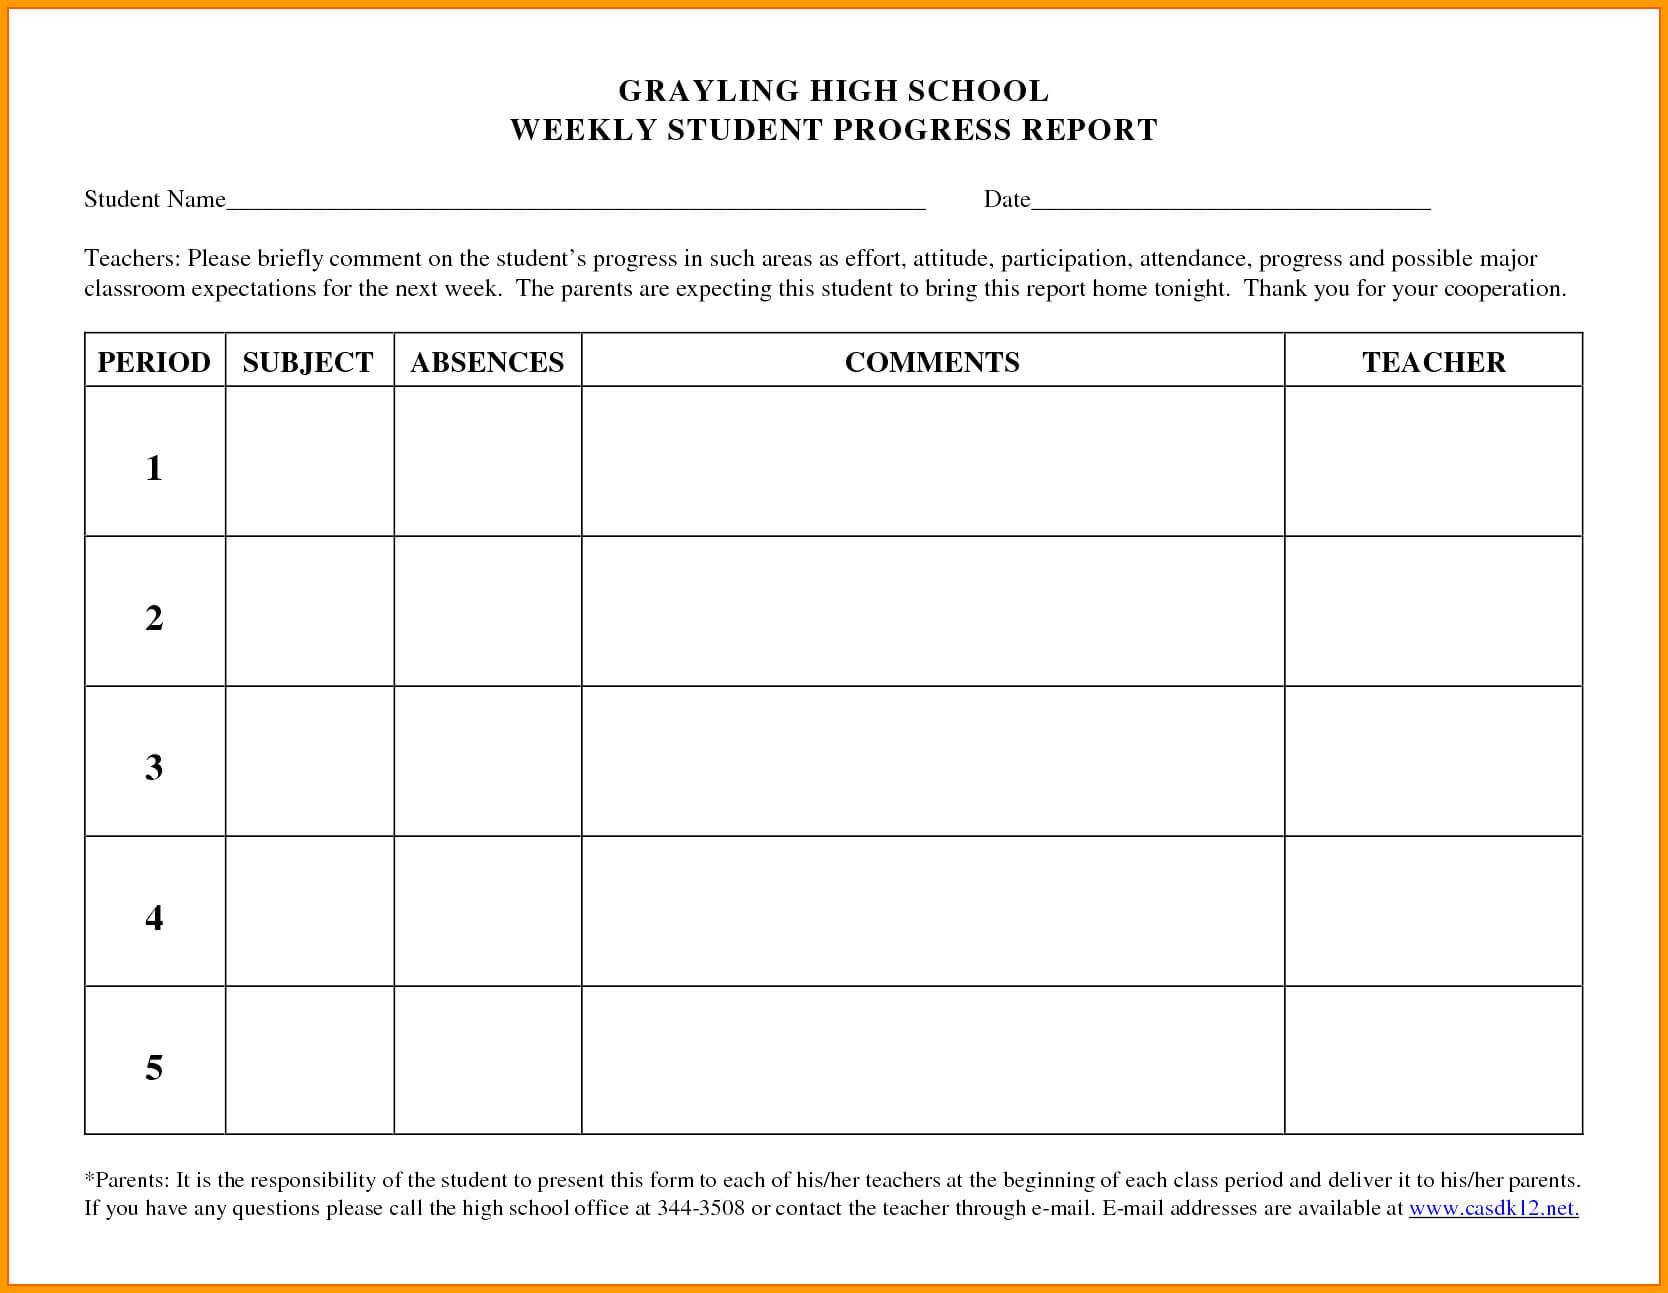 007 Student Progress Report Template Ideas Format Beautiful With High School Progress Report Template